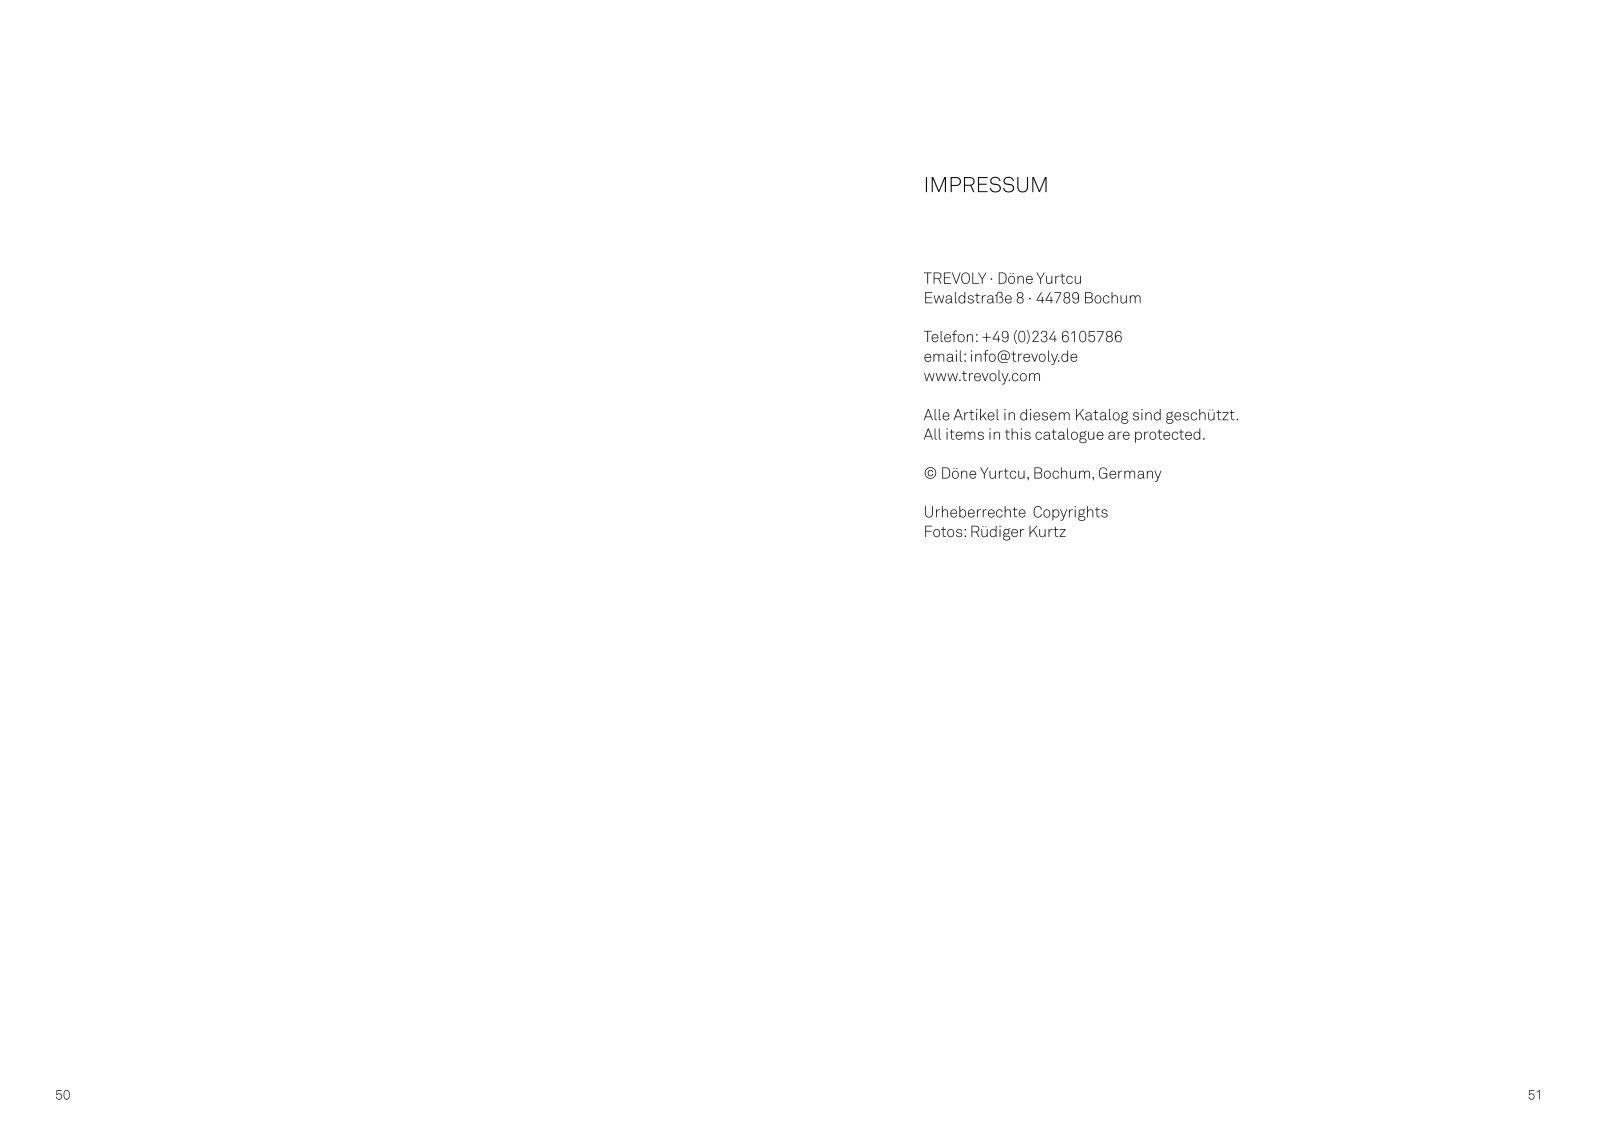 Seite50-51